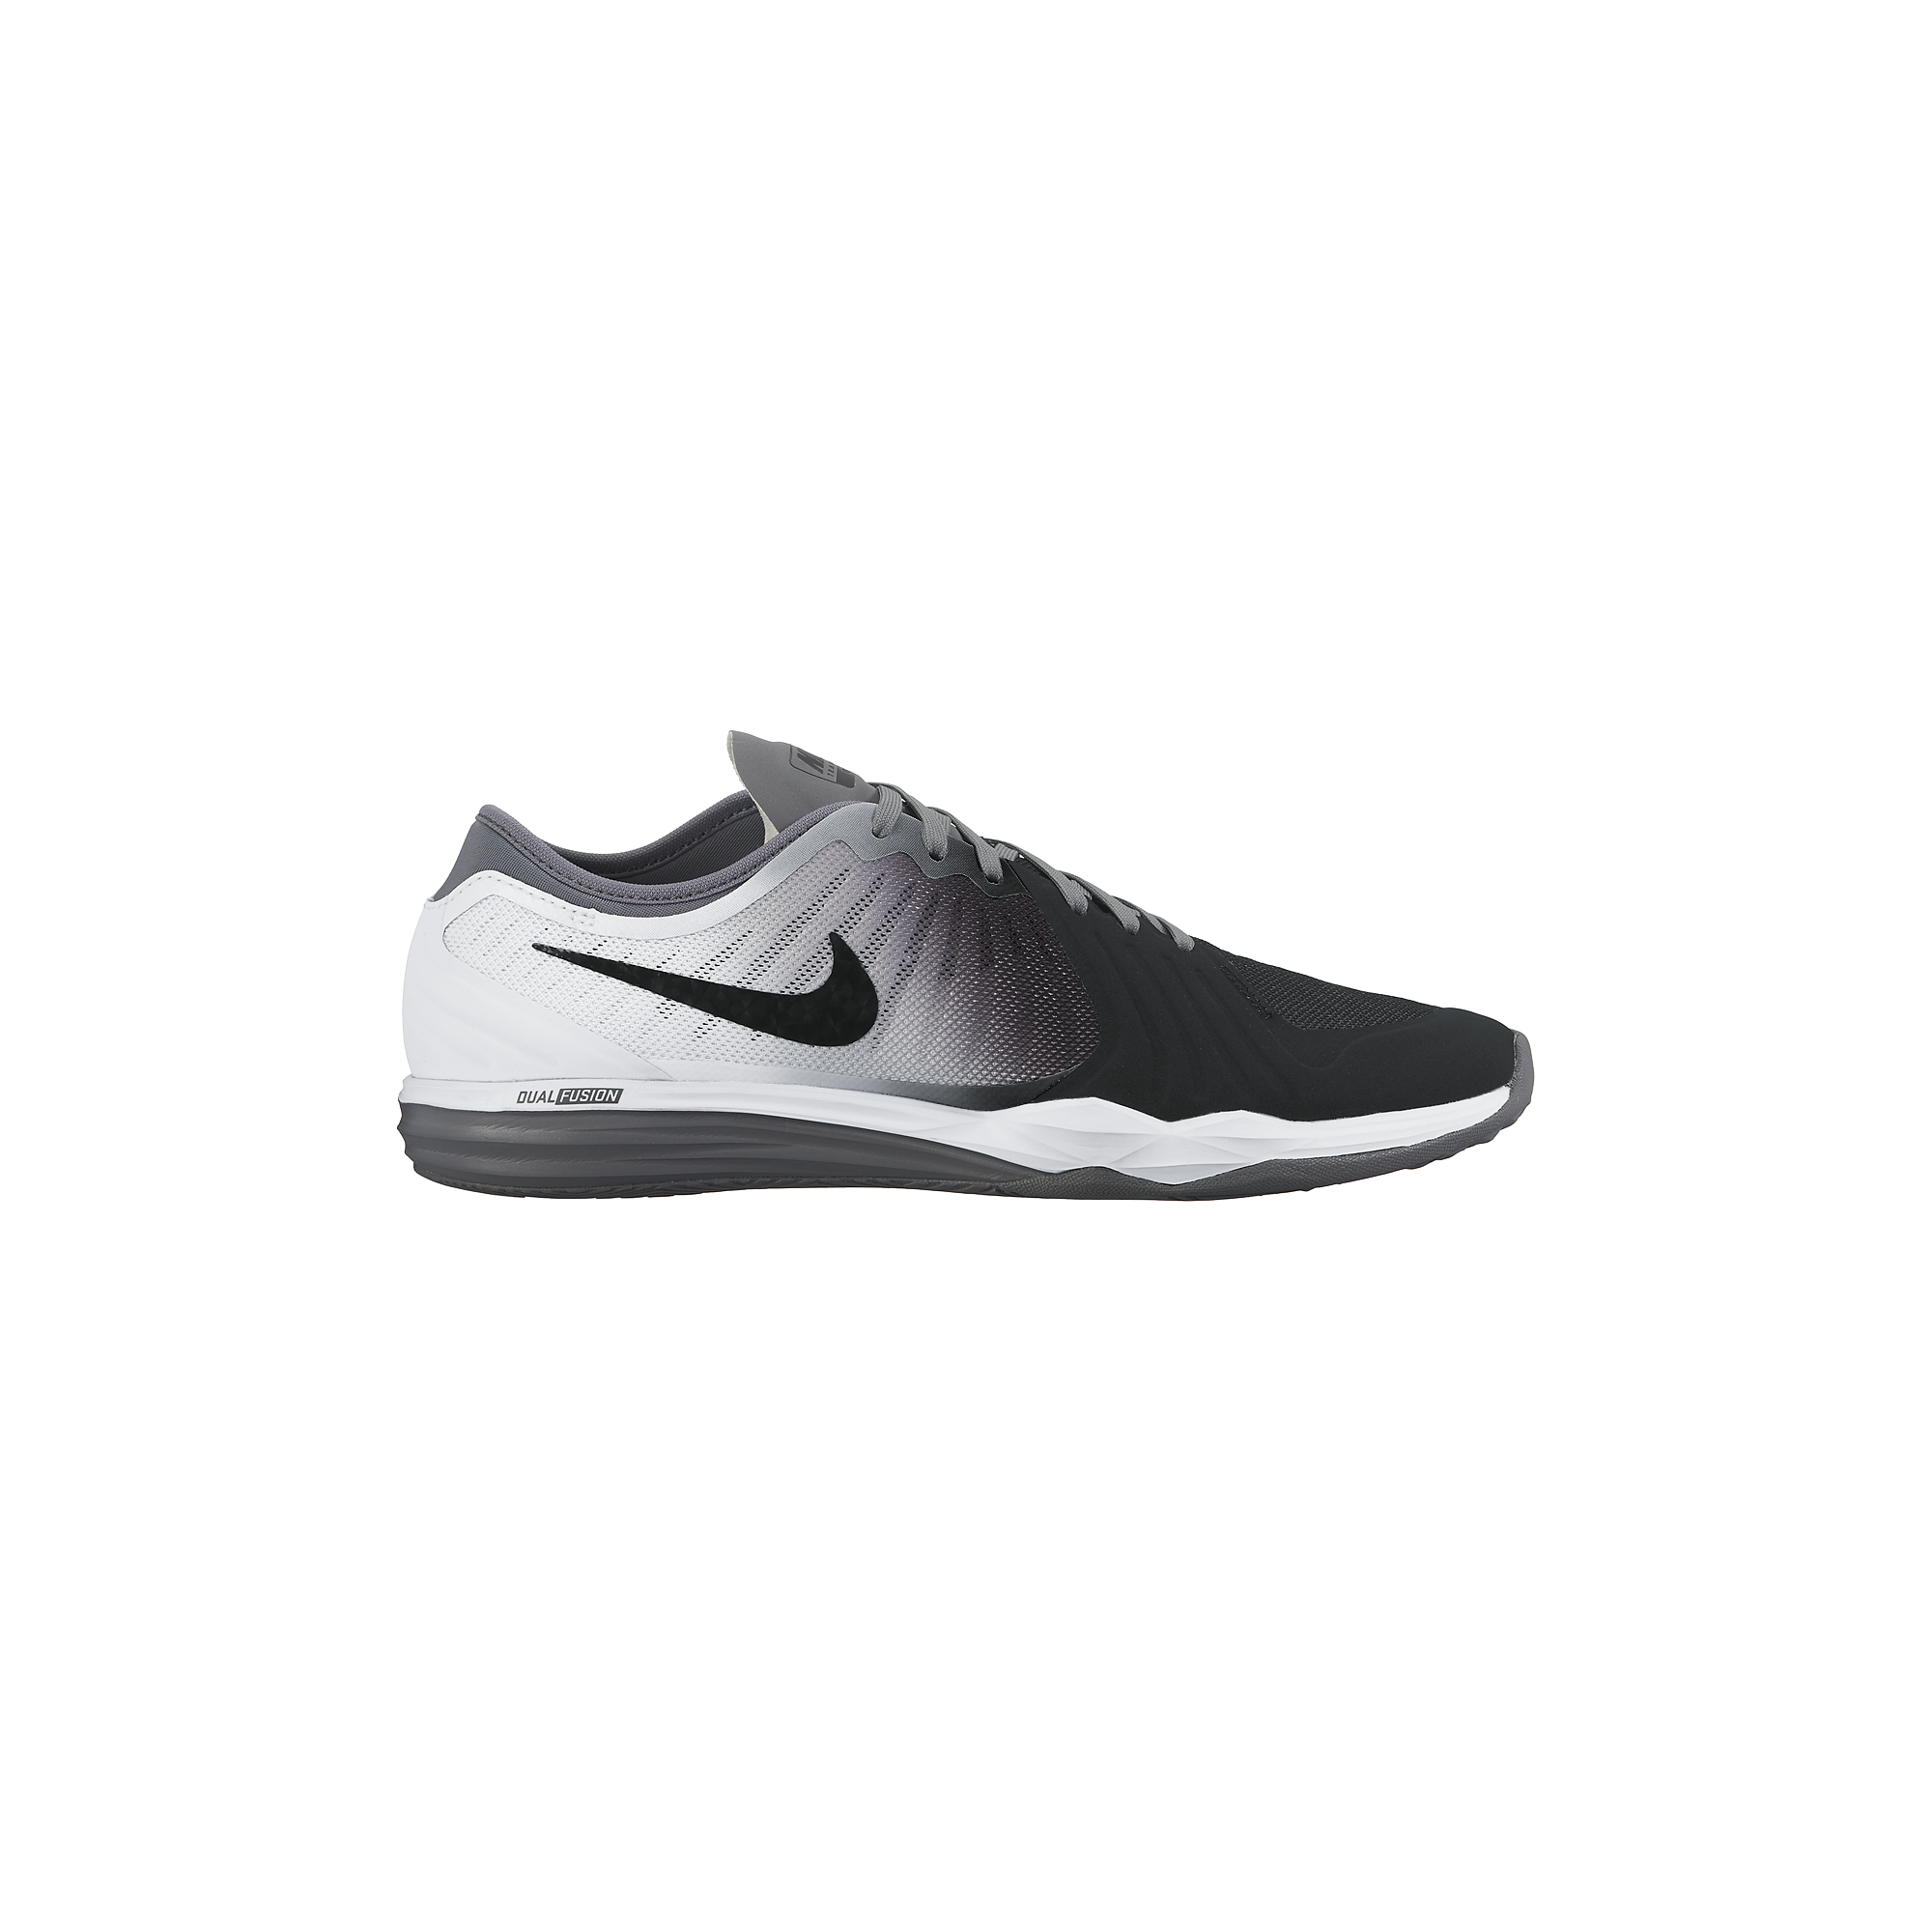 89db8a905a 4 Dual Print Training Cipő 819022 003 Női Fusion Nike W Tr 80XNwPkZnO